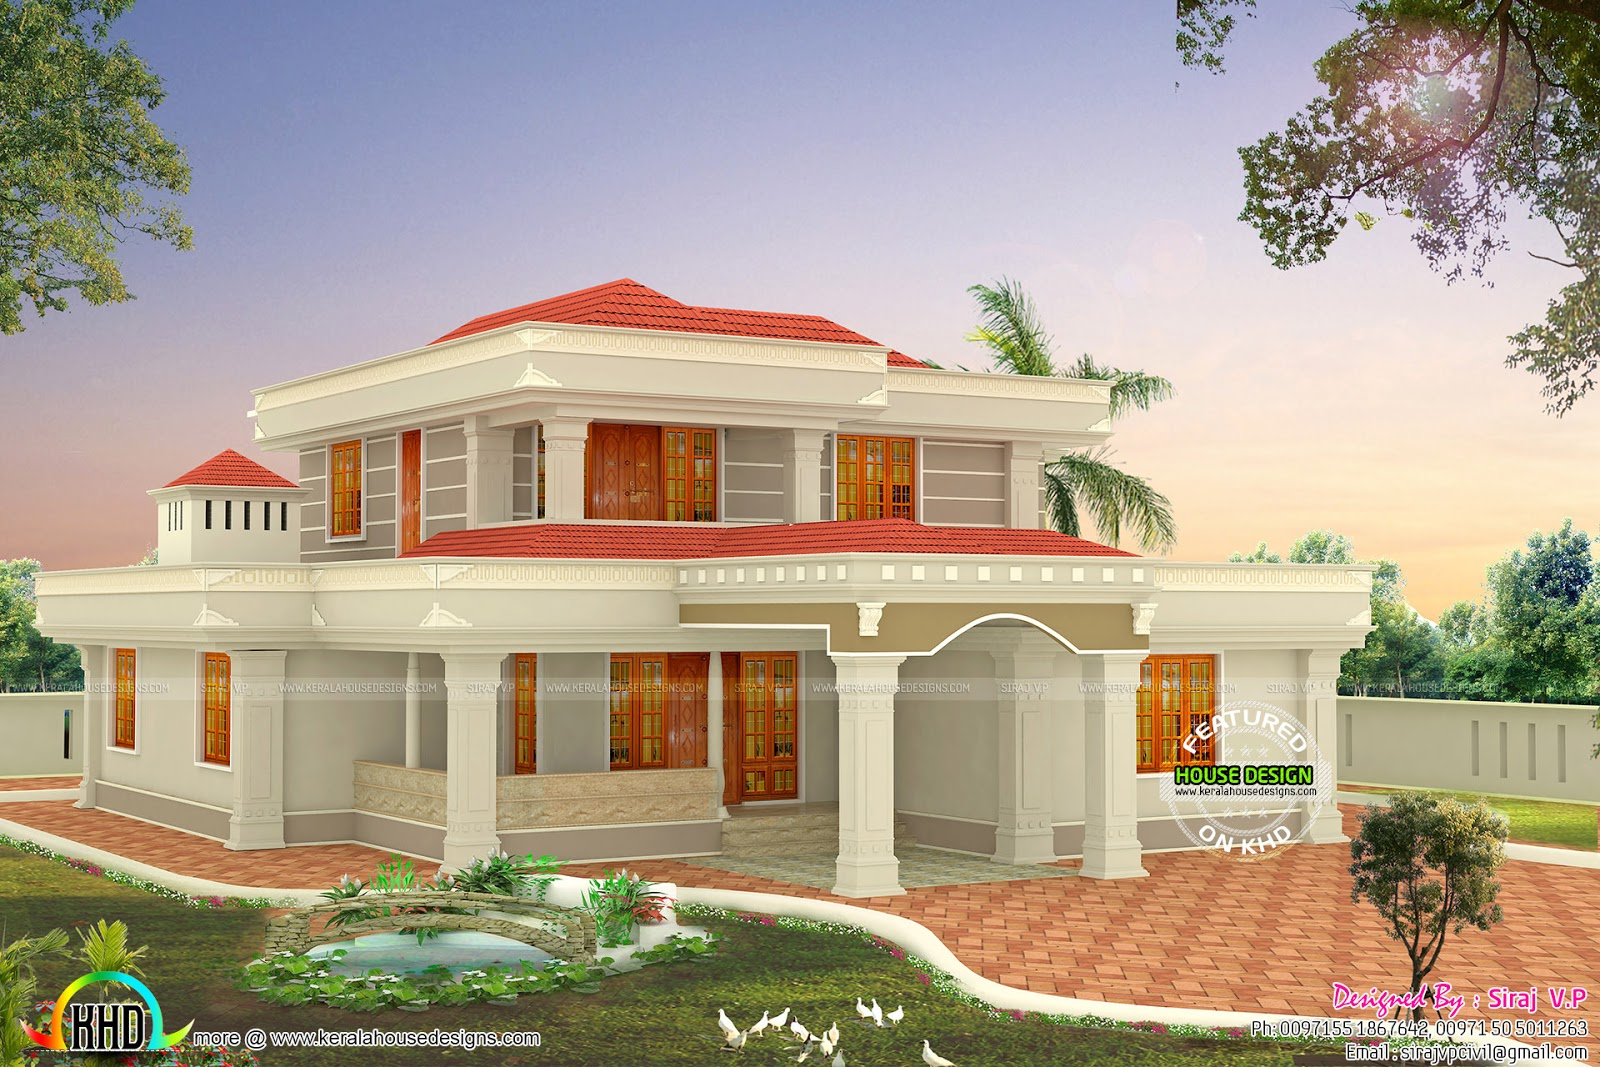 5 bedroom 2800 sq-ft modern home